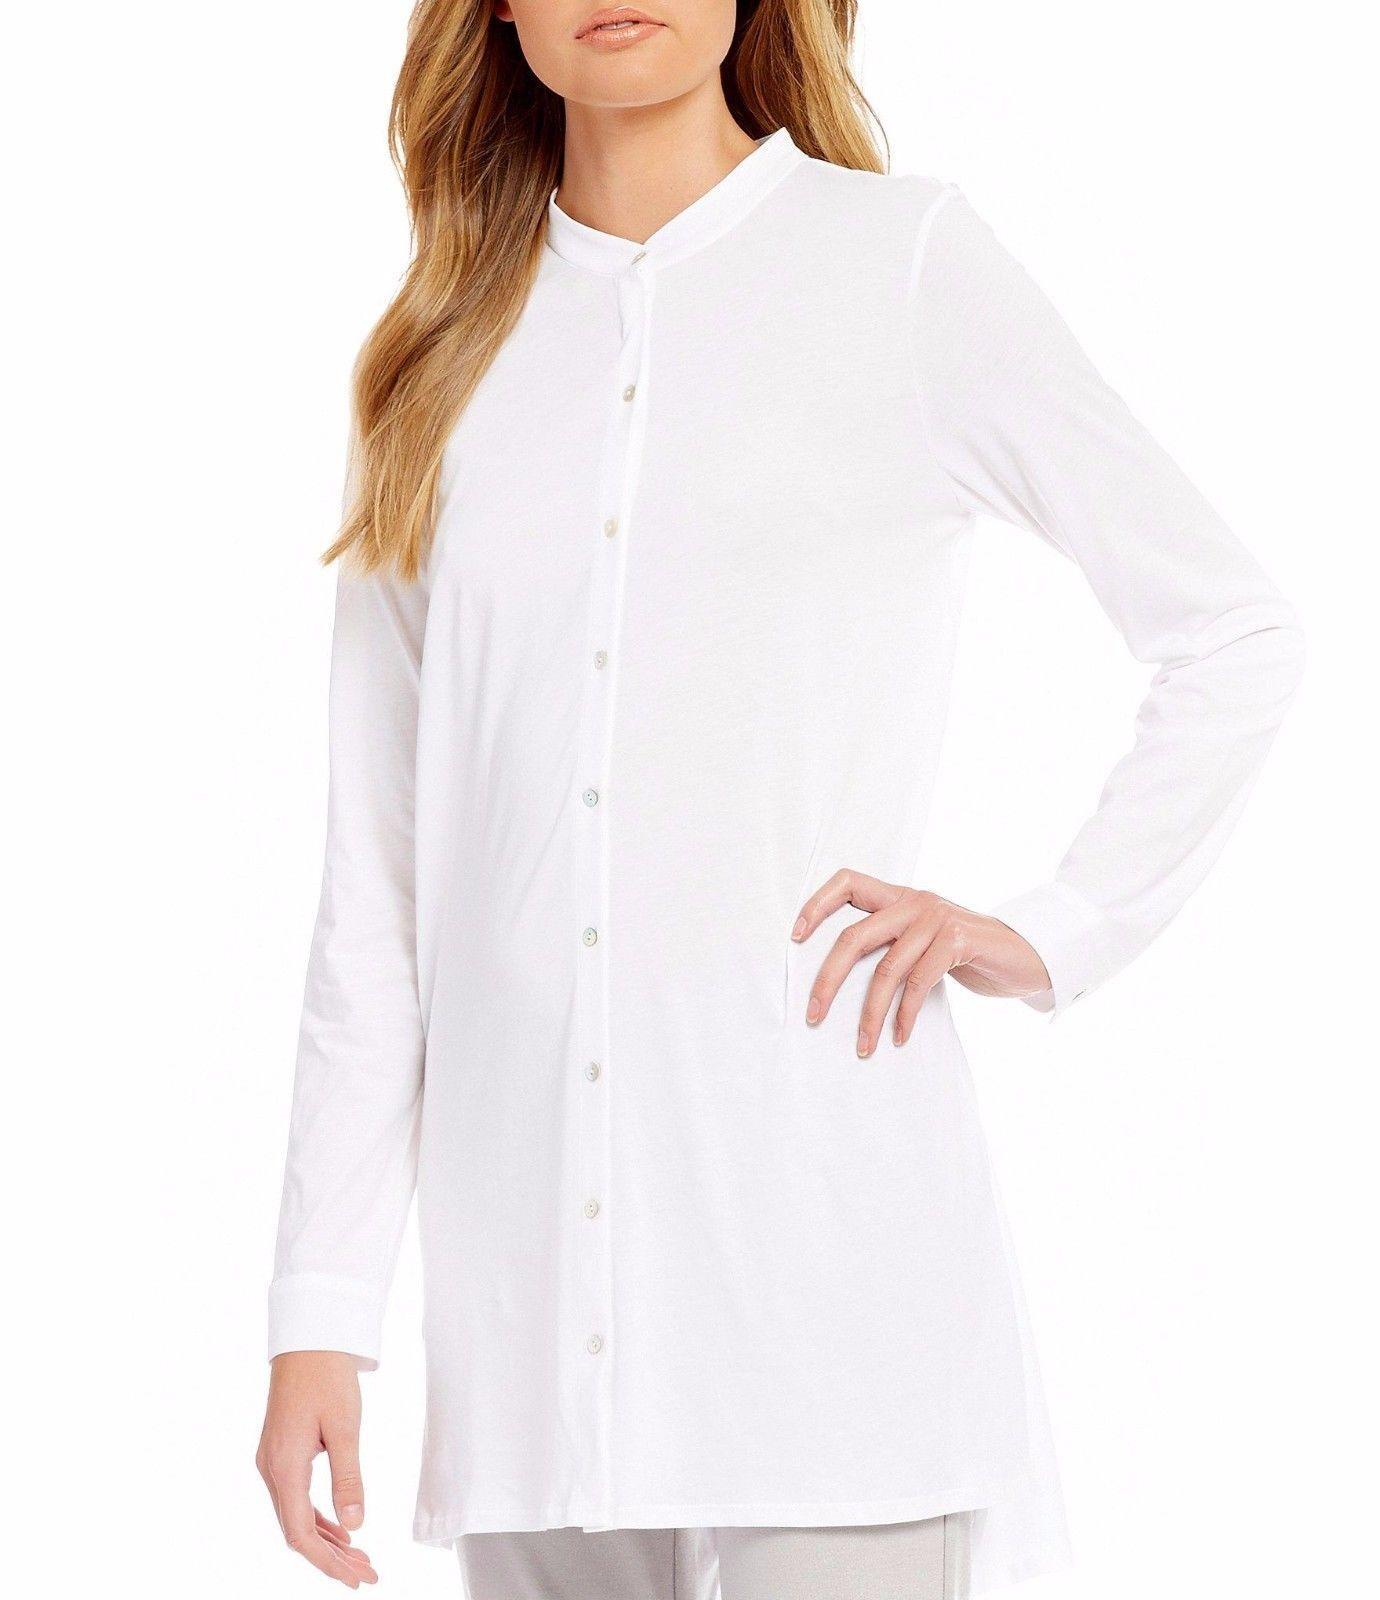 Eileen Fisher White Cotton Jersey Mandarin Collar Tunic Top XXS, XS, L